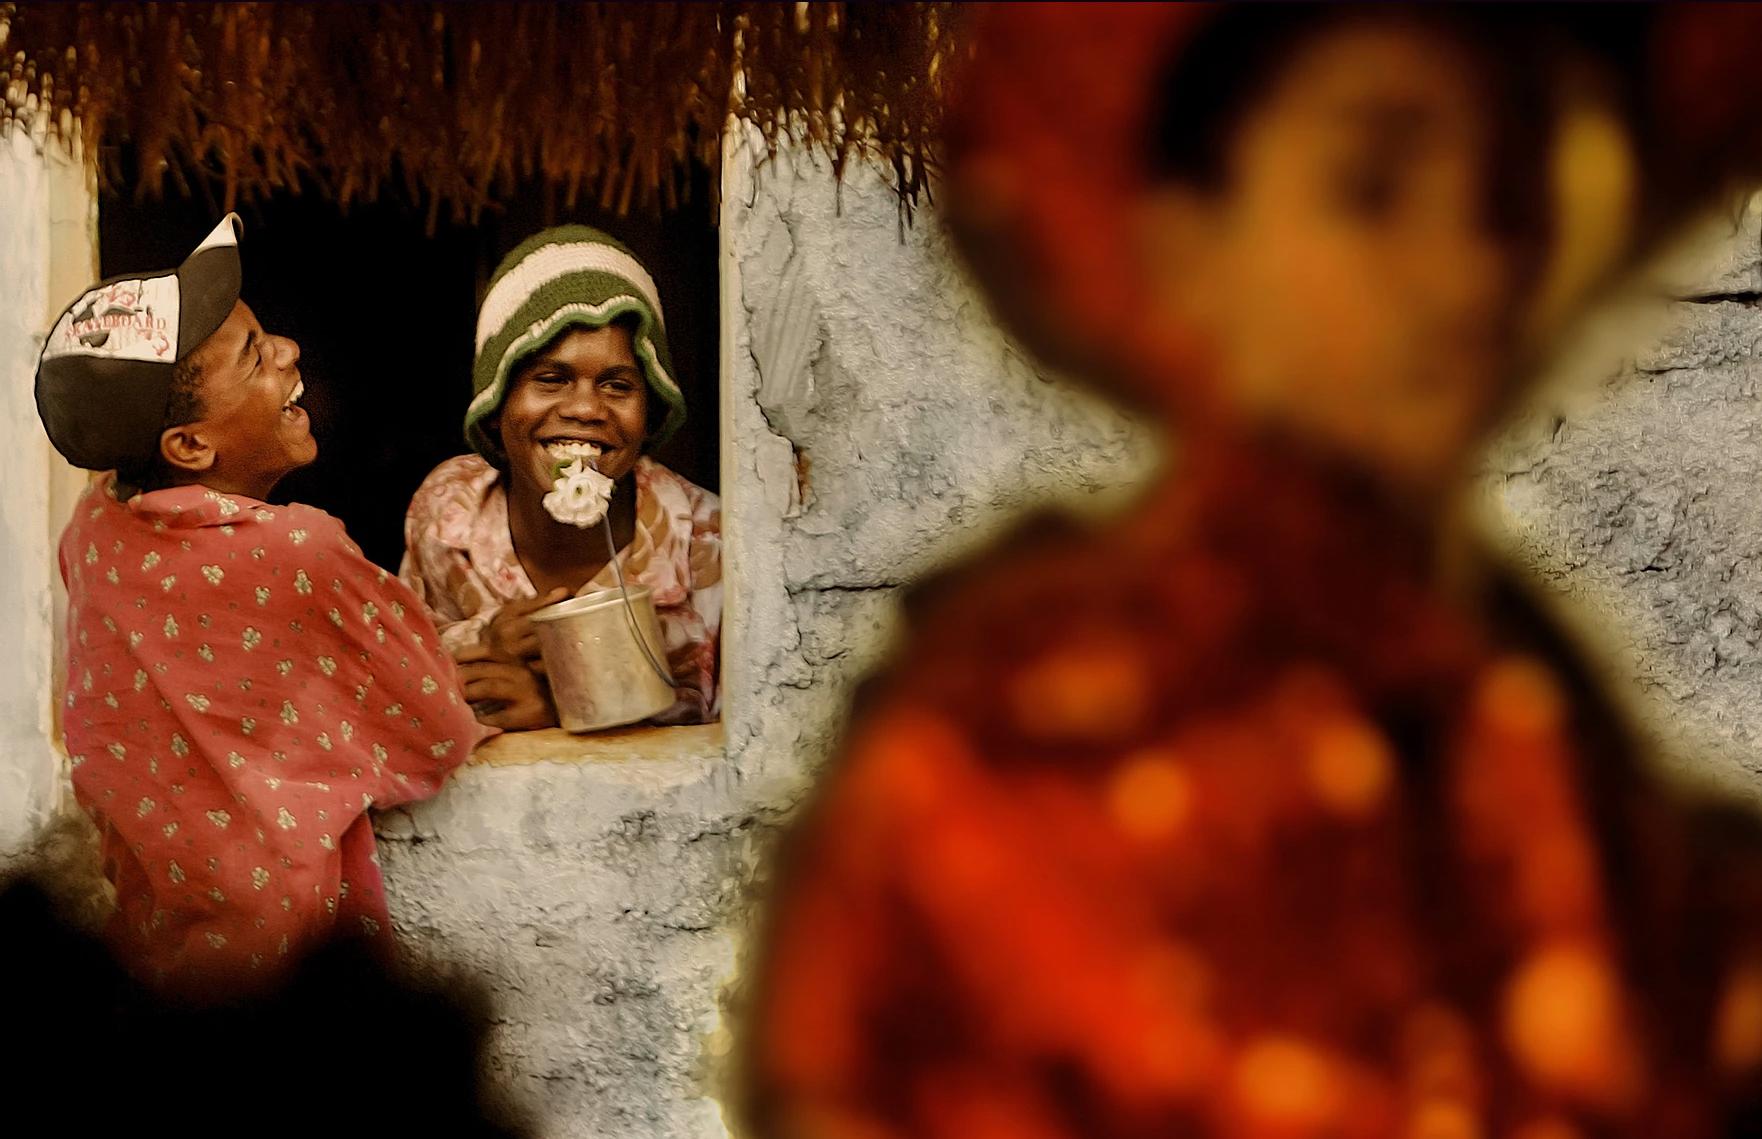 color photo by Alex Almeida from Brazil Tropical light. boys.